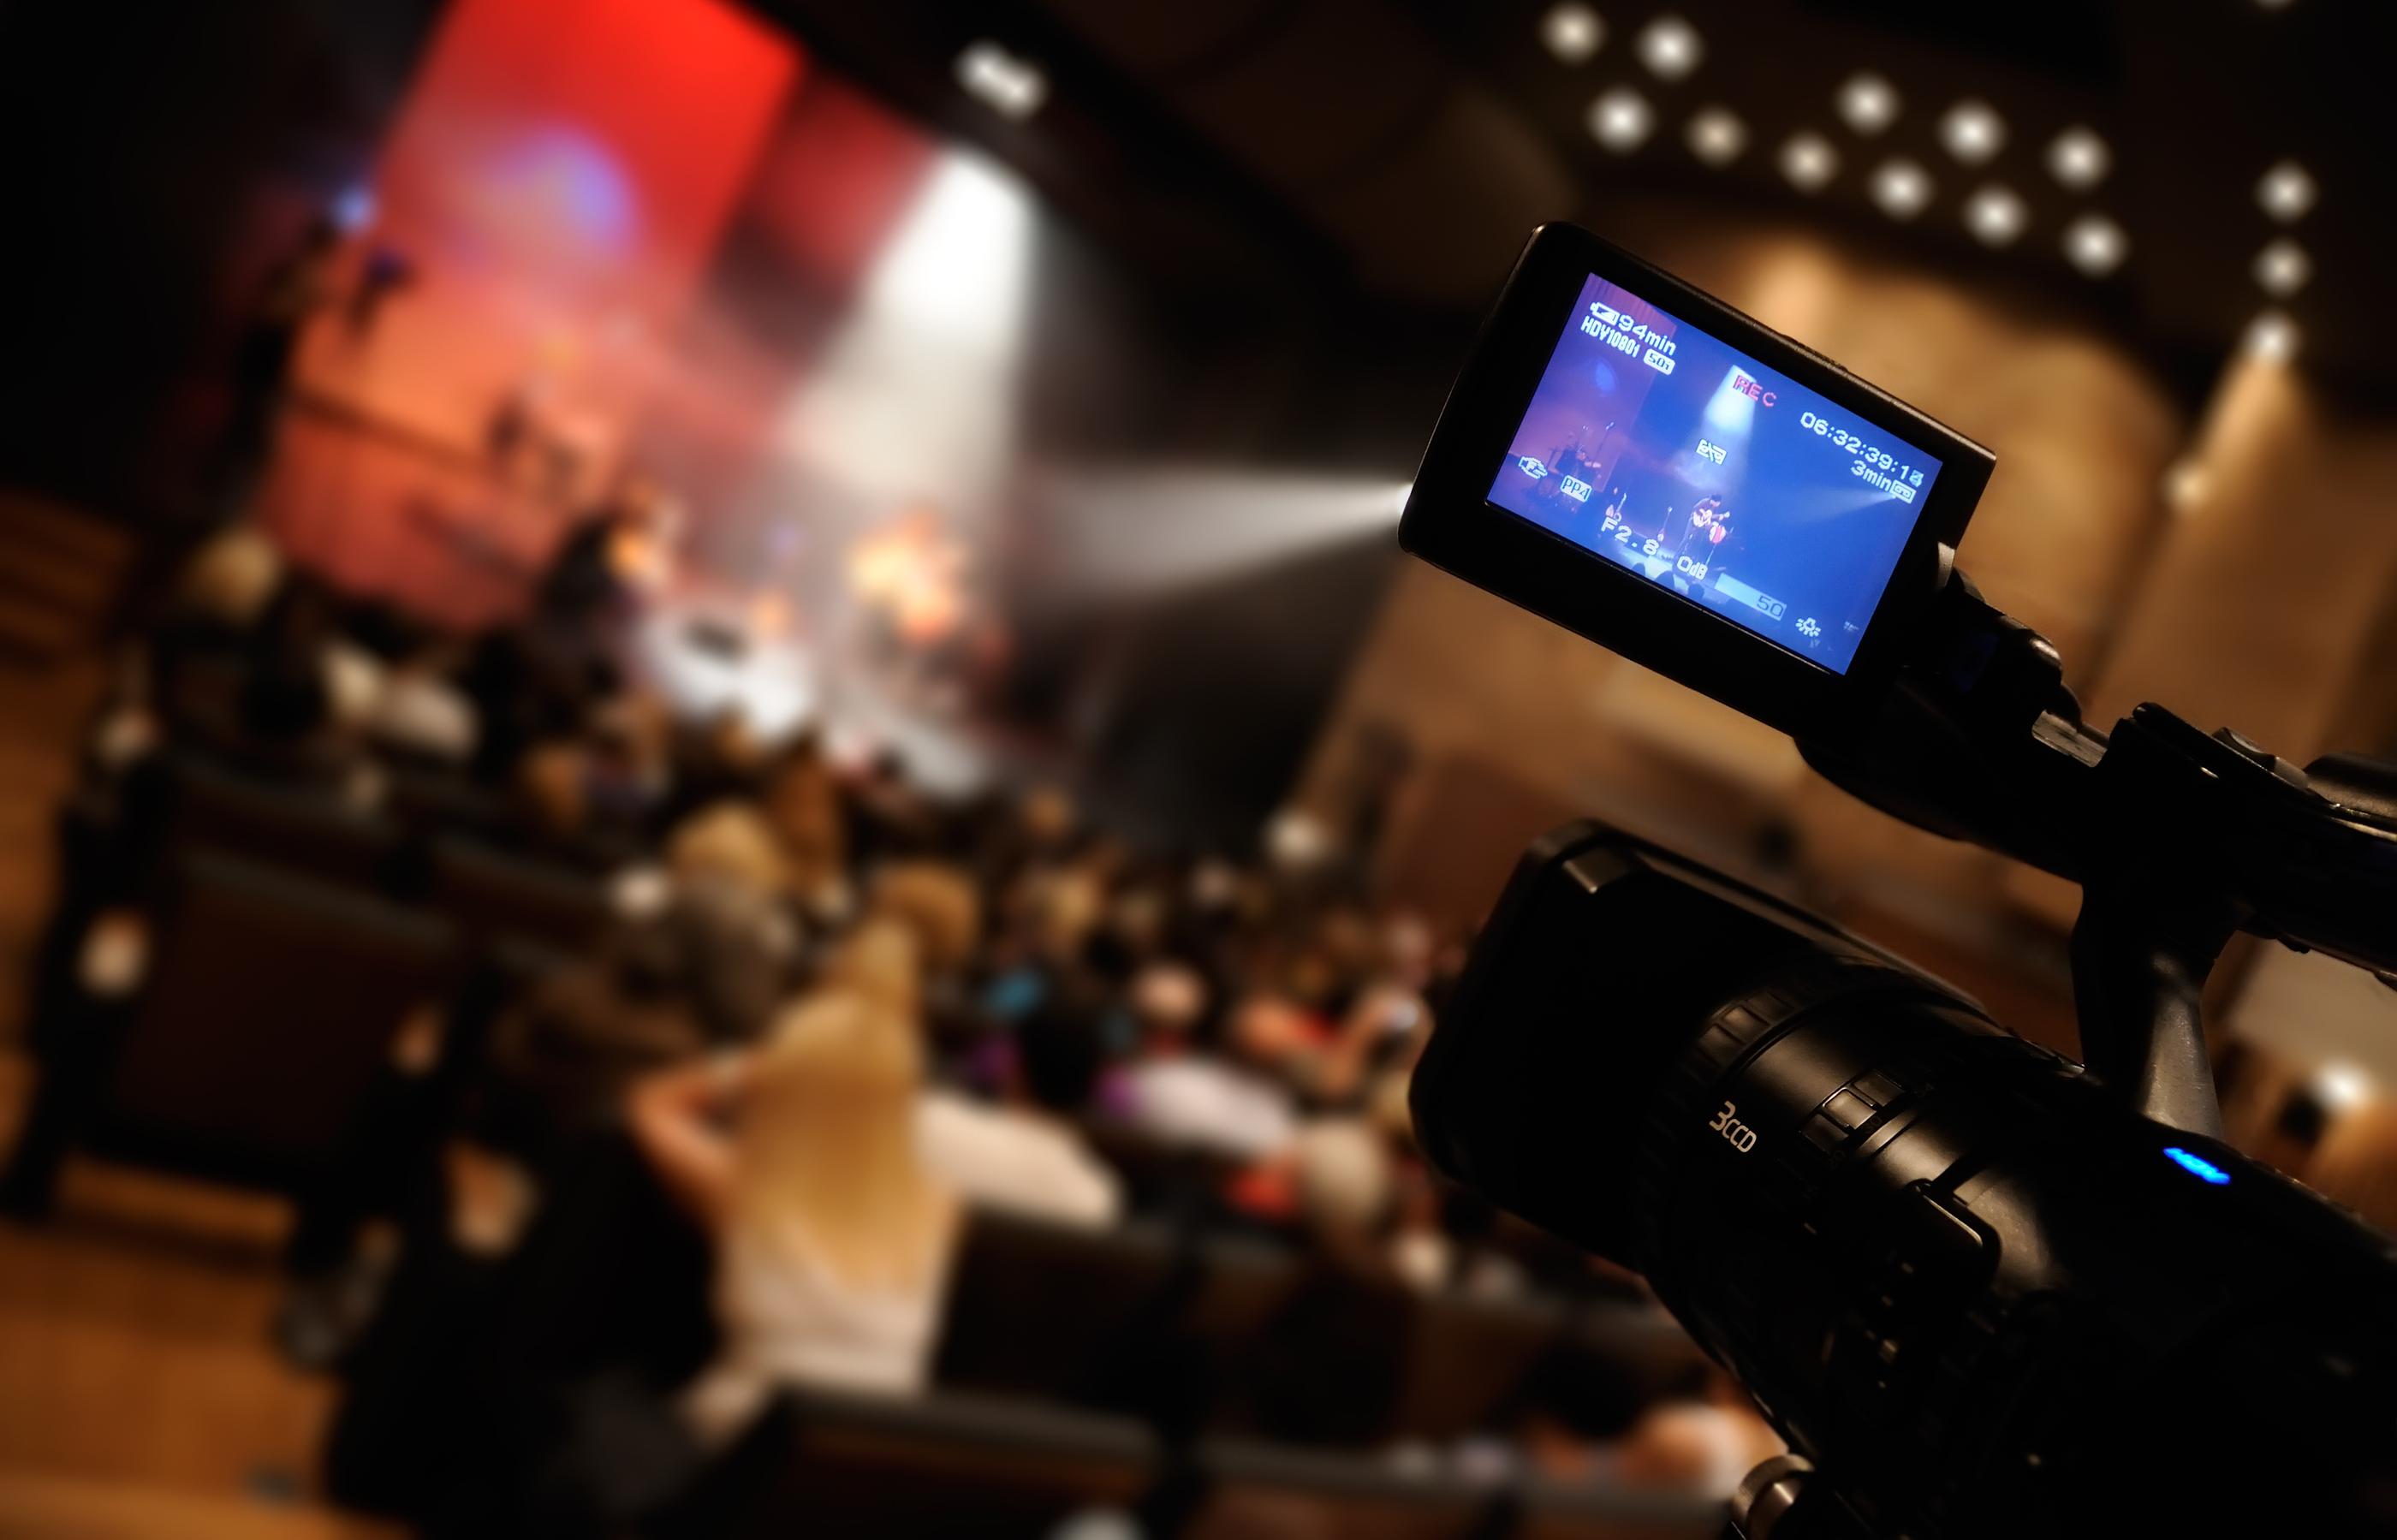 bigstock-Video-camera-lcd-display-pro-19280225